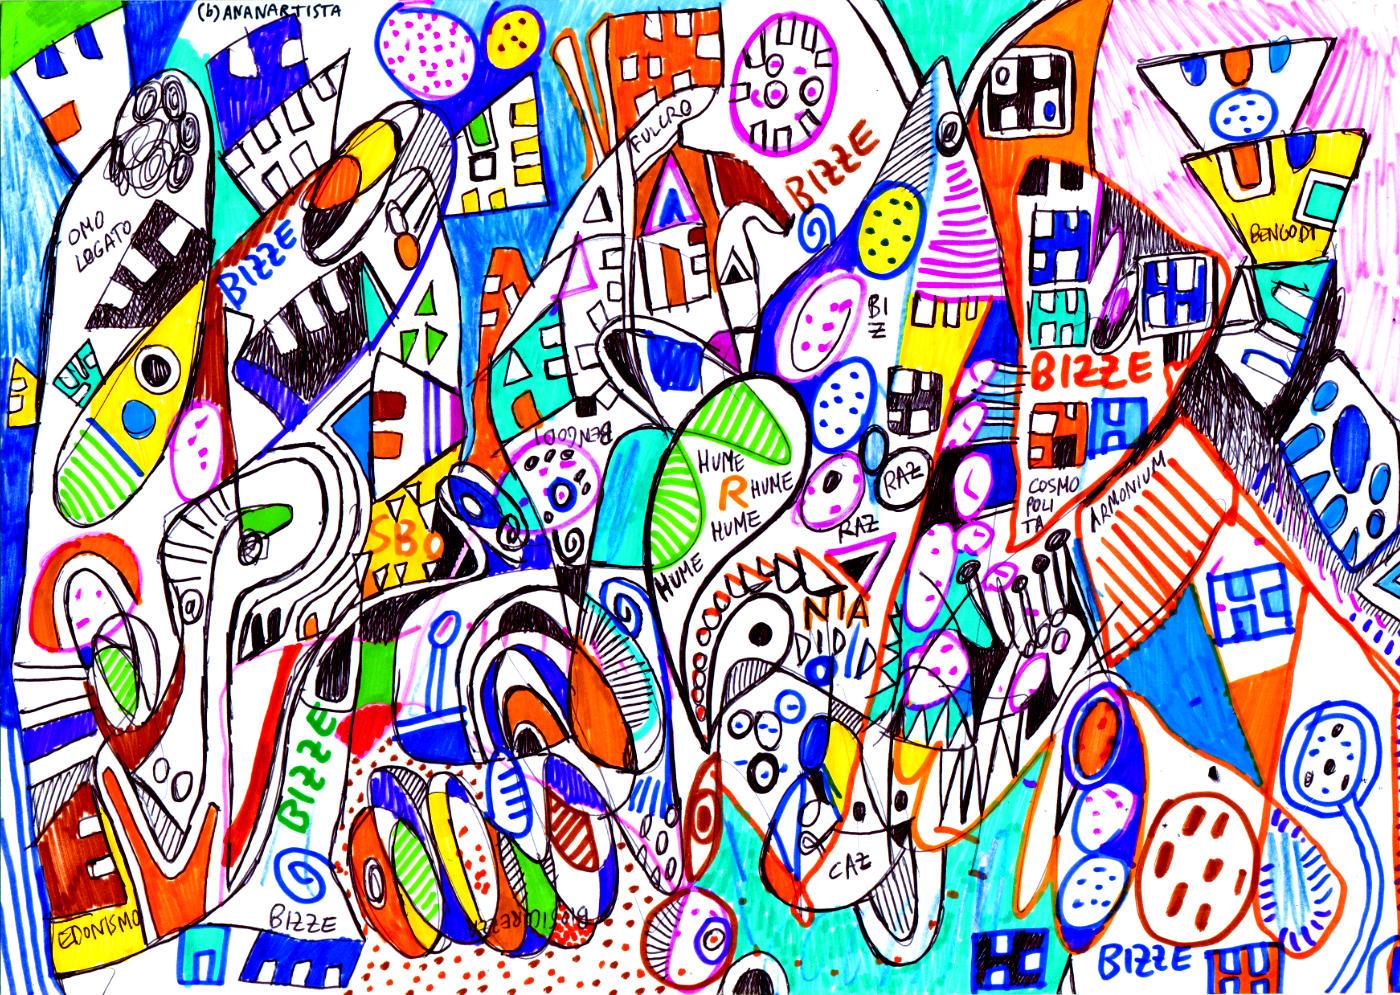 paese di bengodi - arte astratta di (b)ananartista sbuff